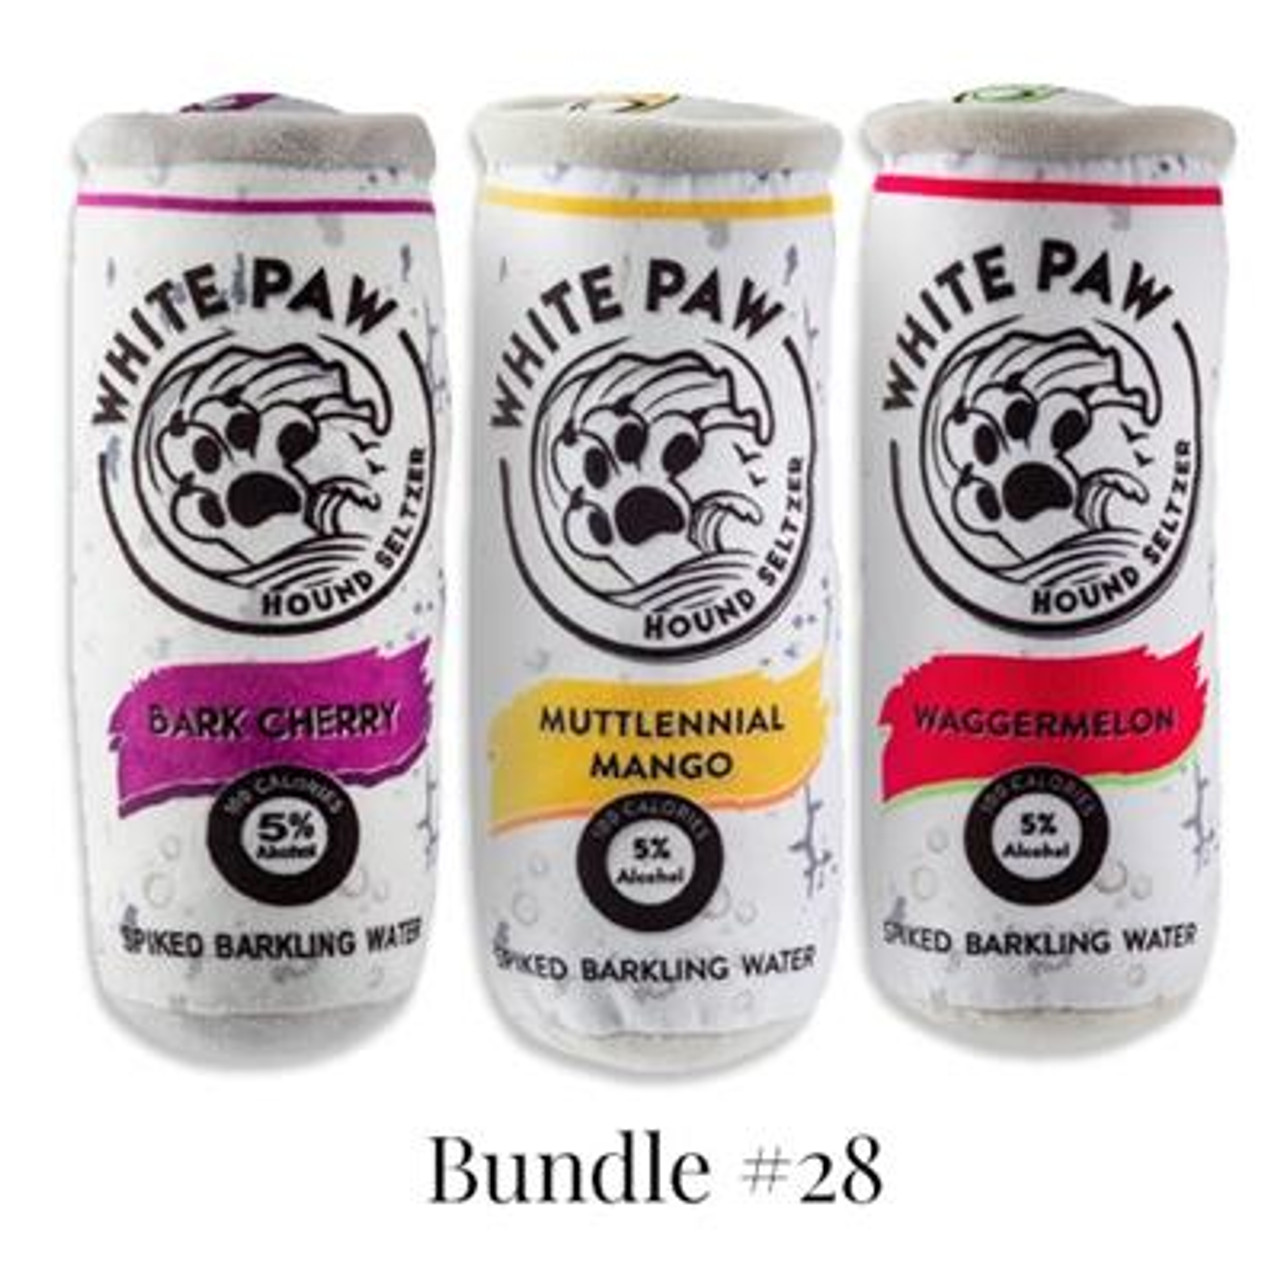 White Paw 3 Pack Gift Set